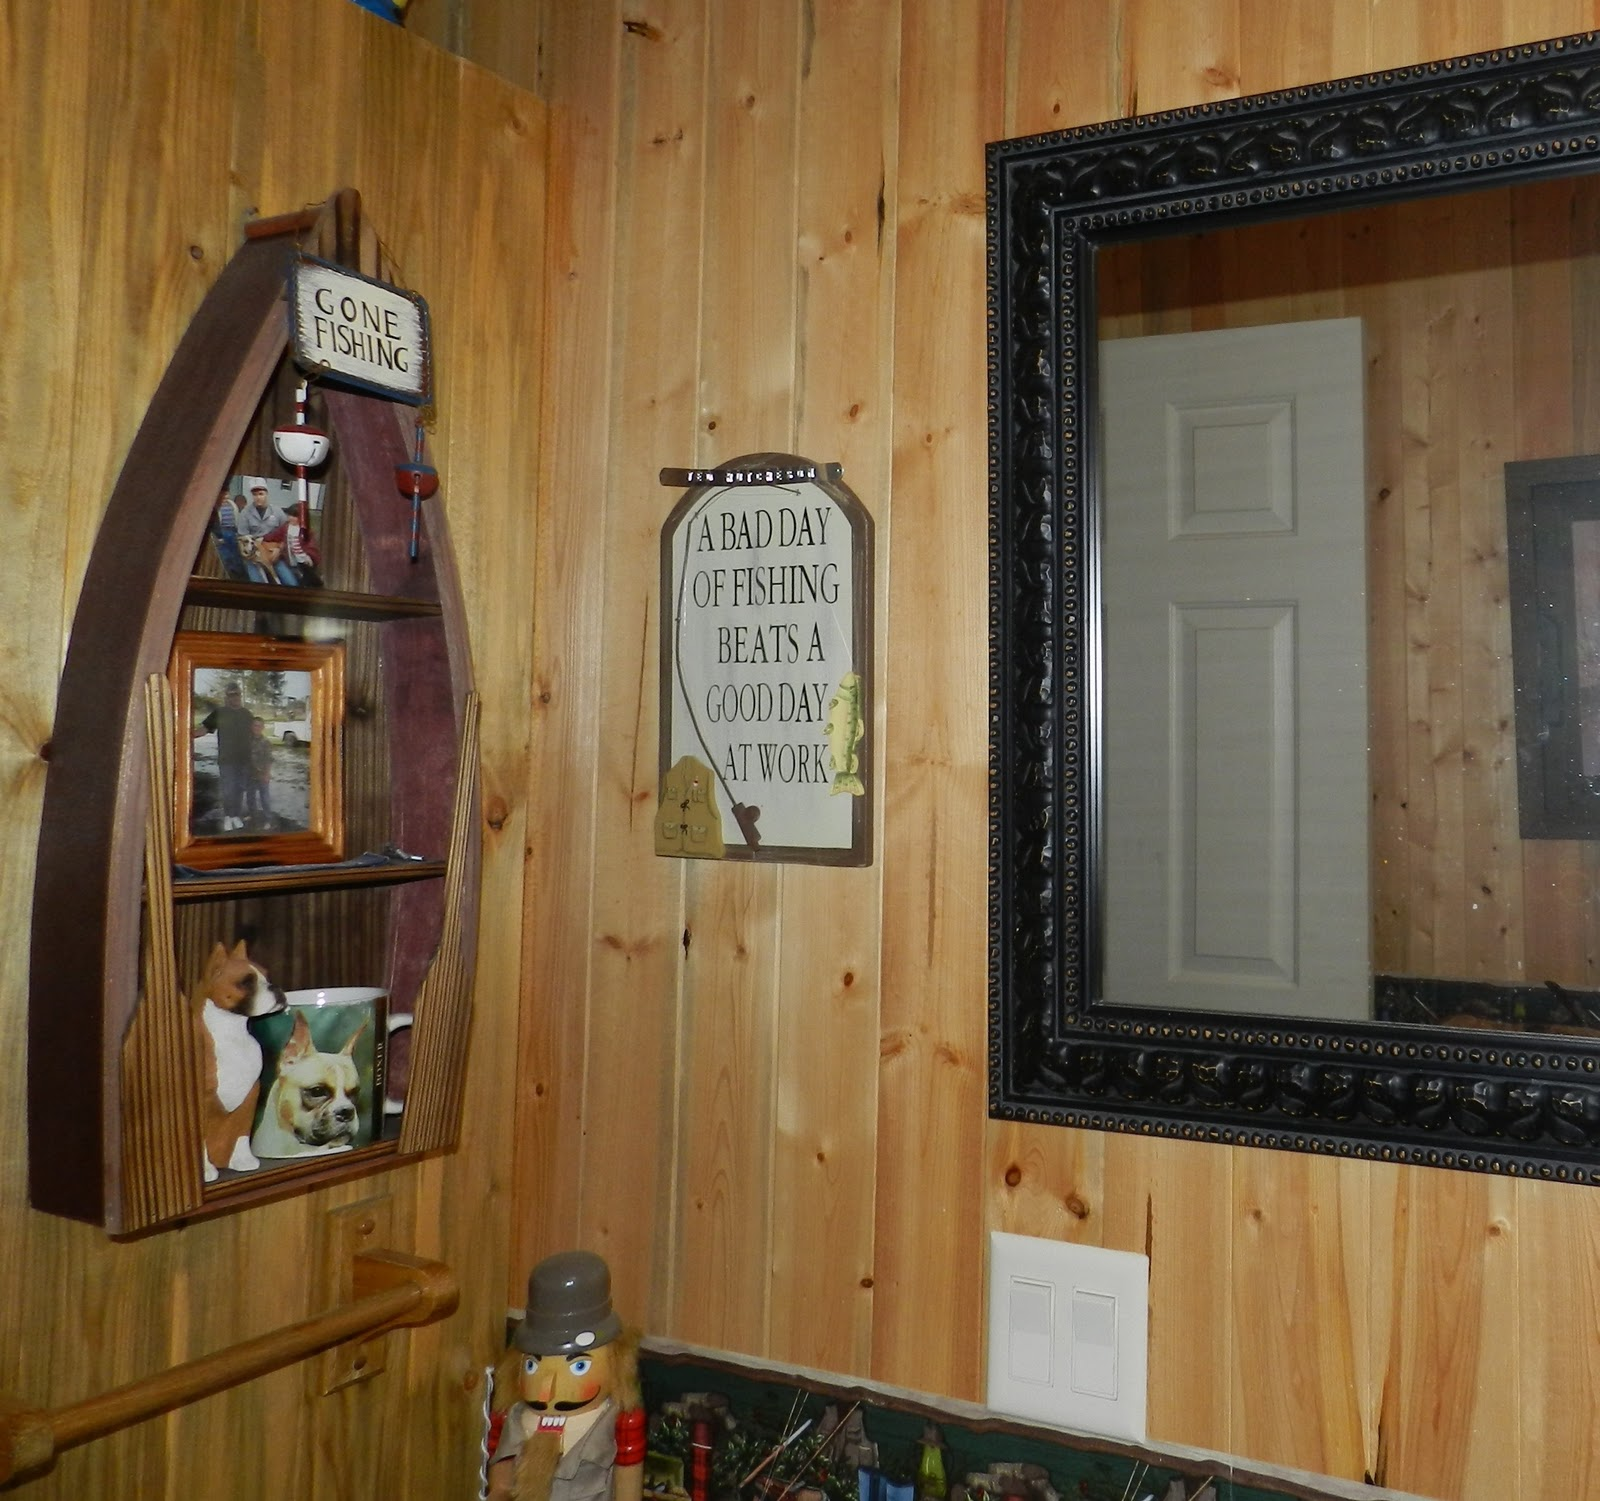 Lodge Themed Bathroom Decor: SweetPepperRose: Gone Fishing Theme Bathroom